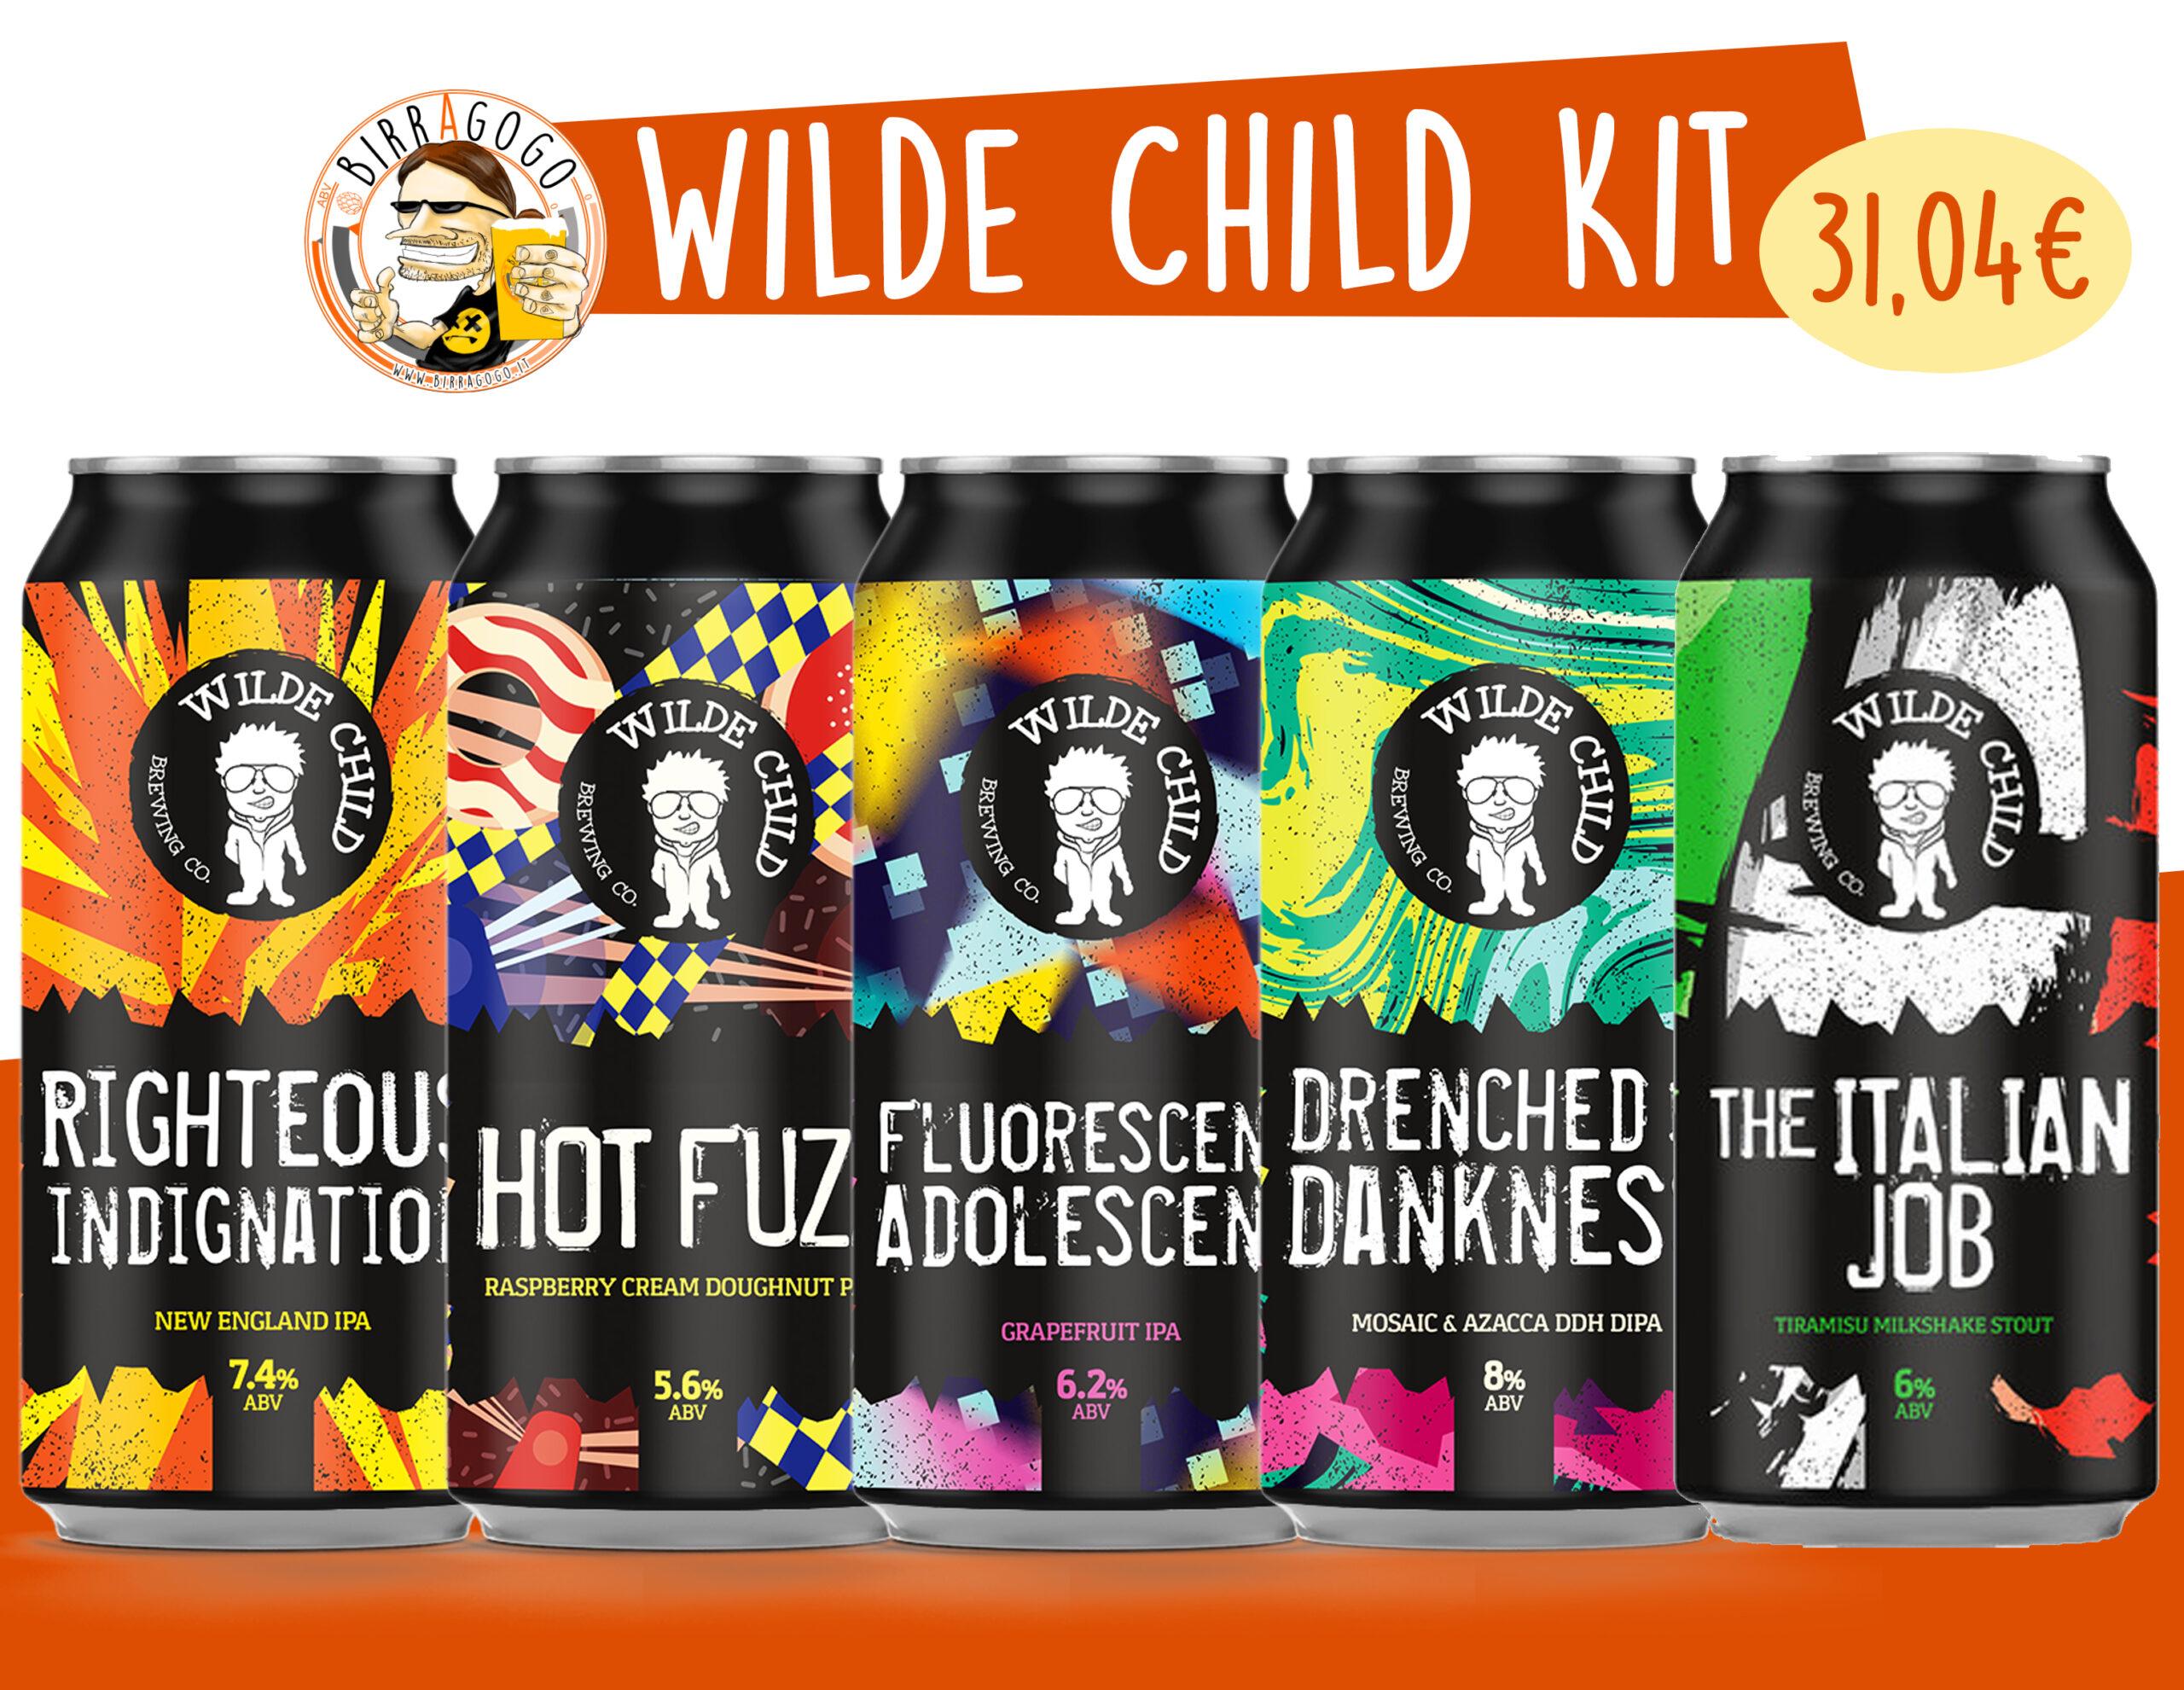 Wilde Child Kit